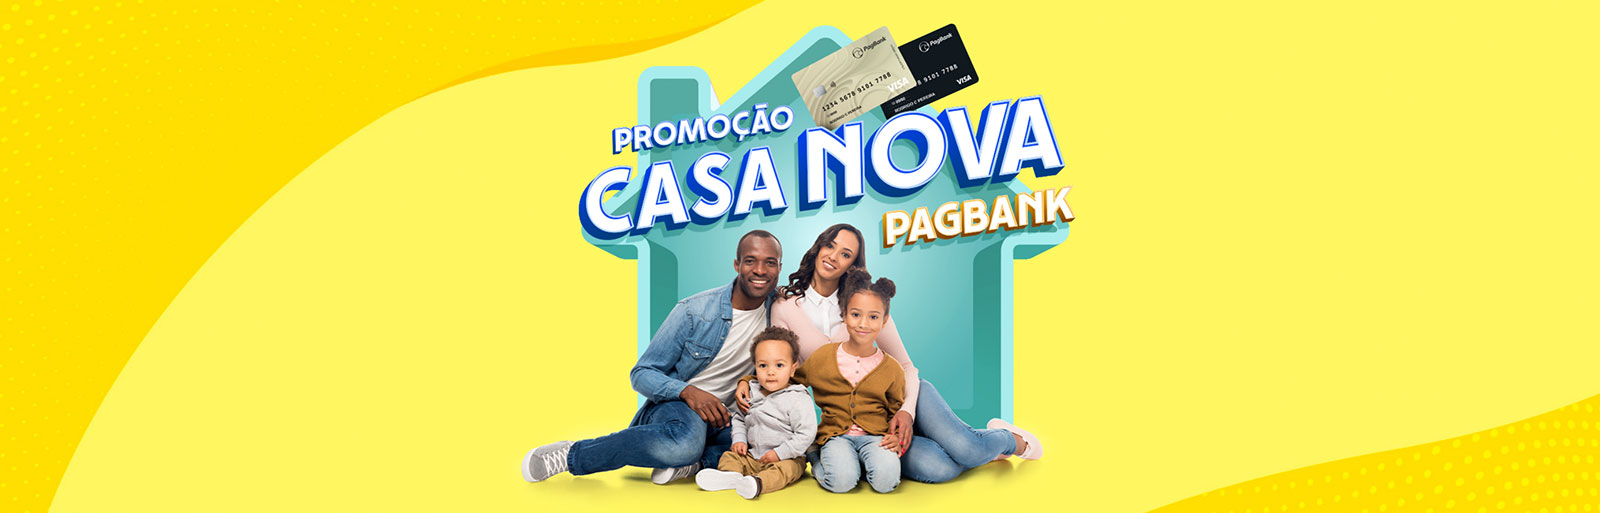 Promoção Casa Nova PagBank